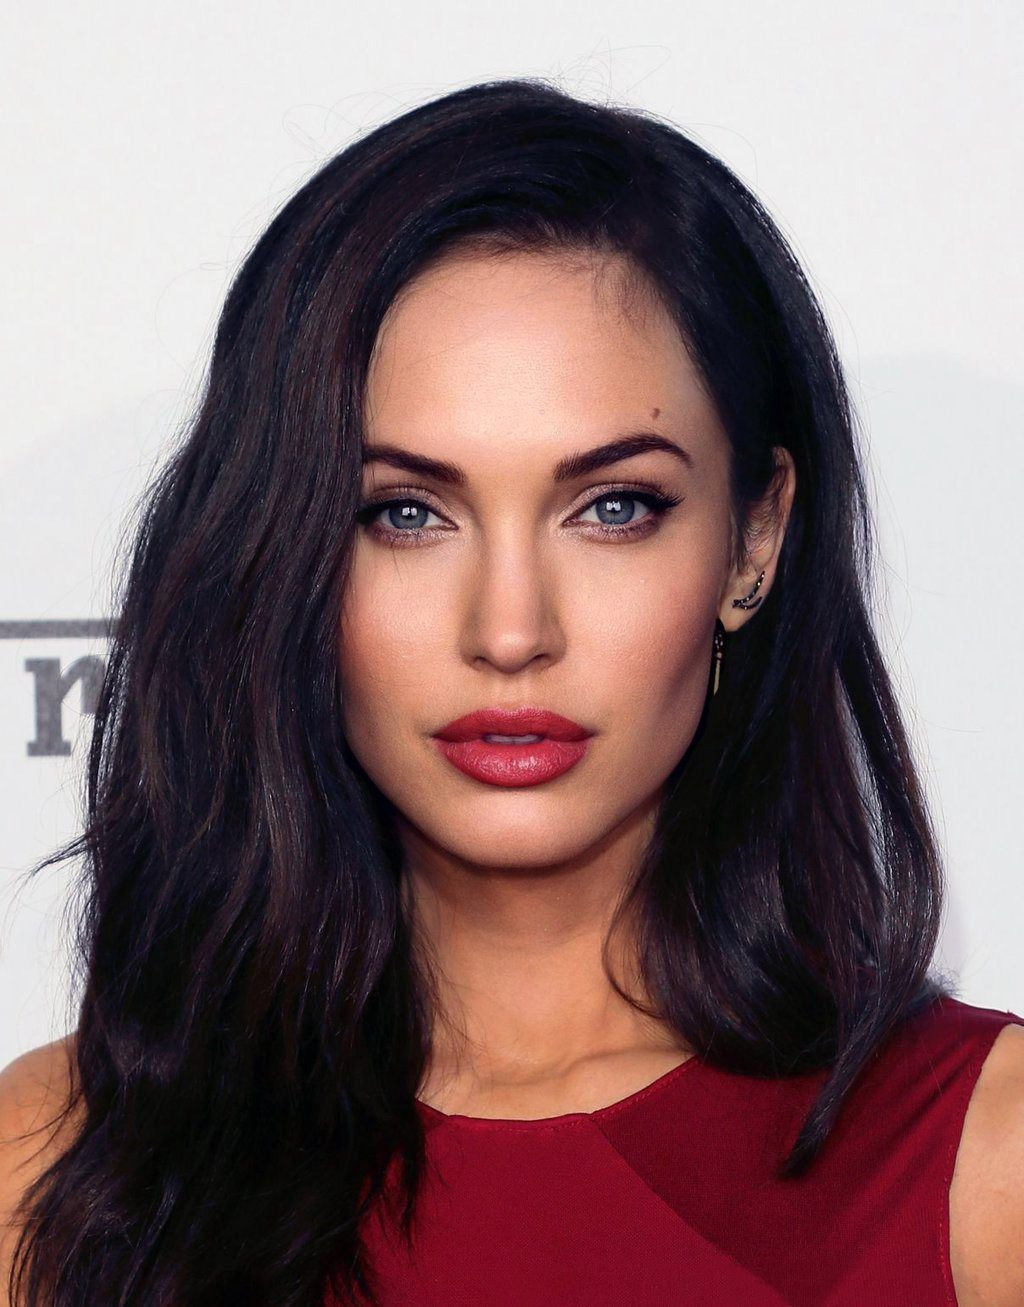 Megan Fox Angelina Jolie Hybrid Photoshop